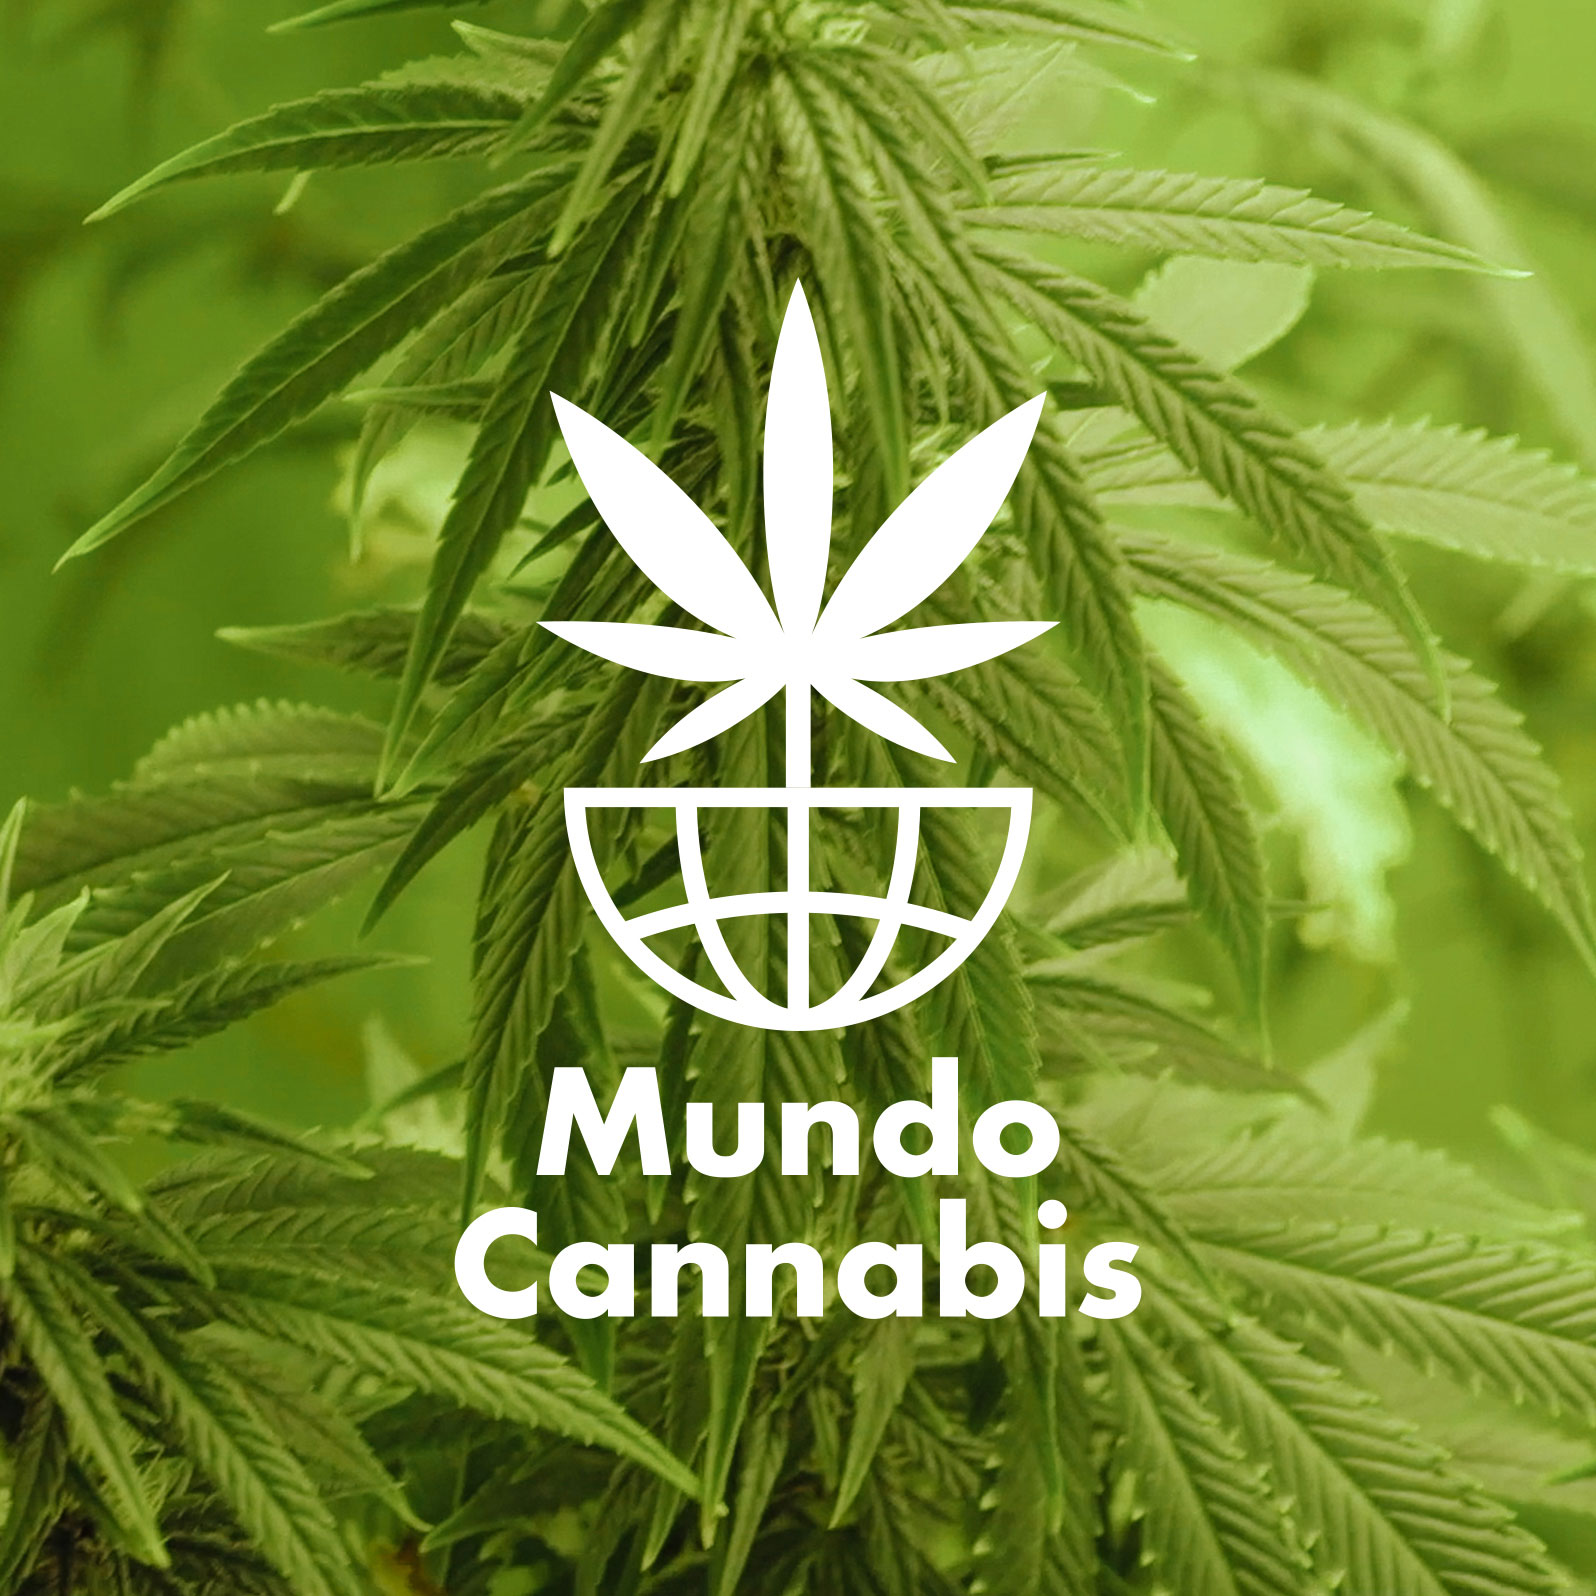 Mundo Cannabis